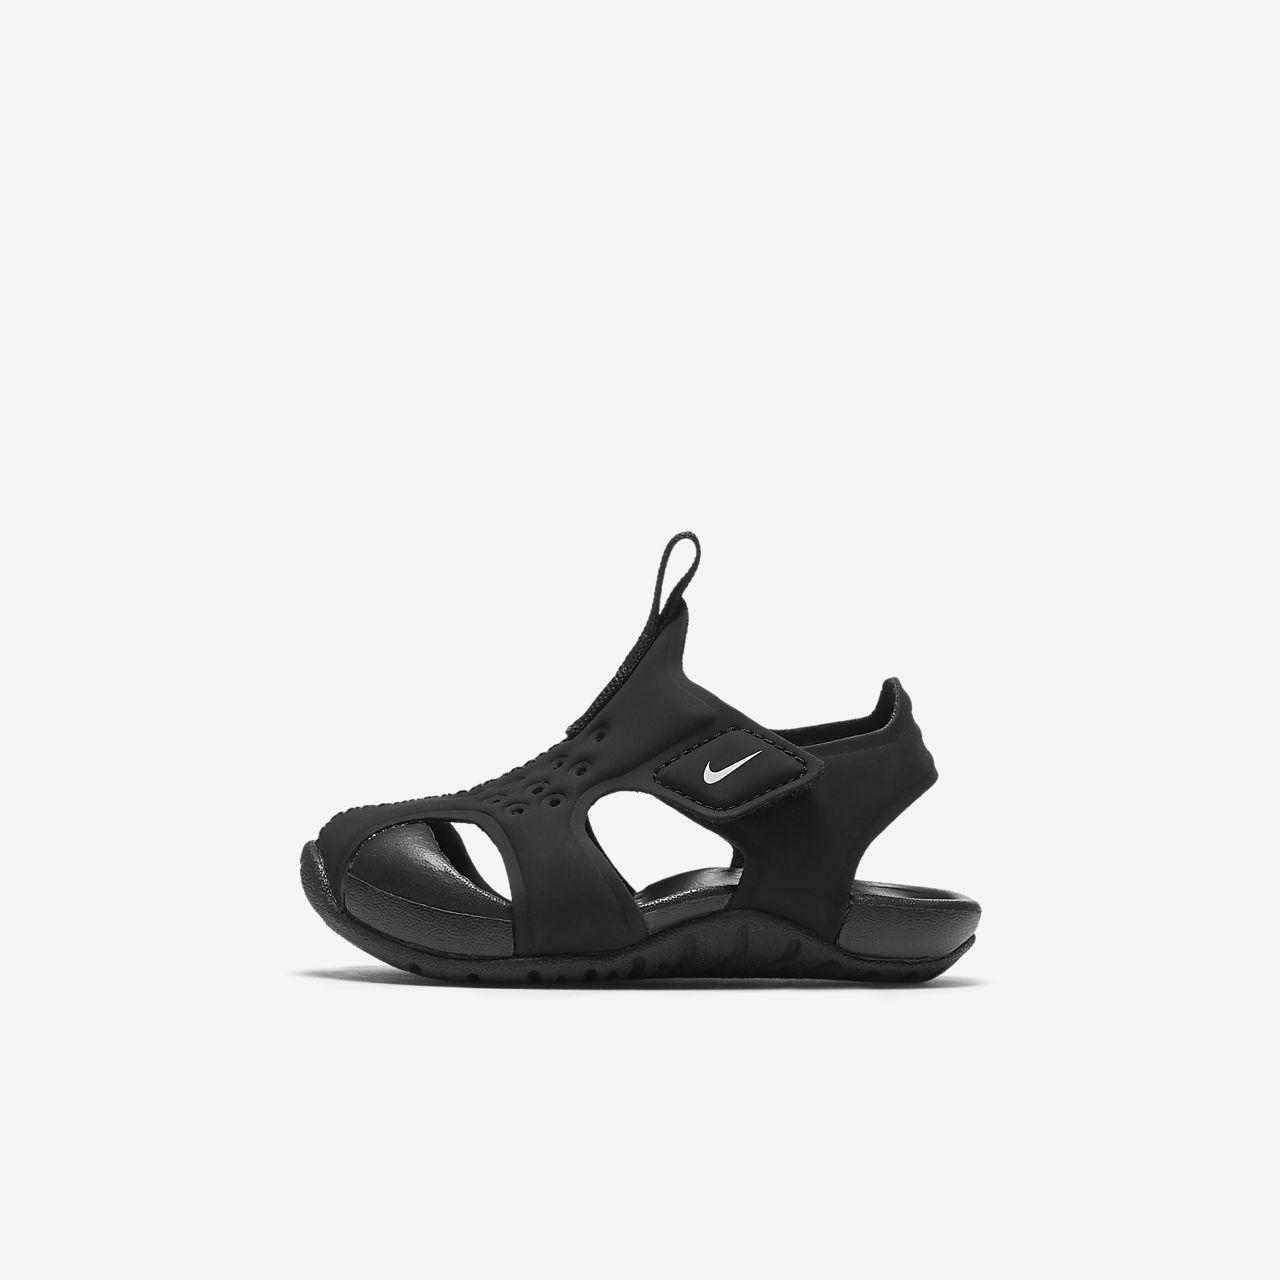 54ed660dd Nike Sunray Protect 2 Infant Toddler Sandal